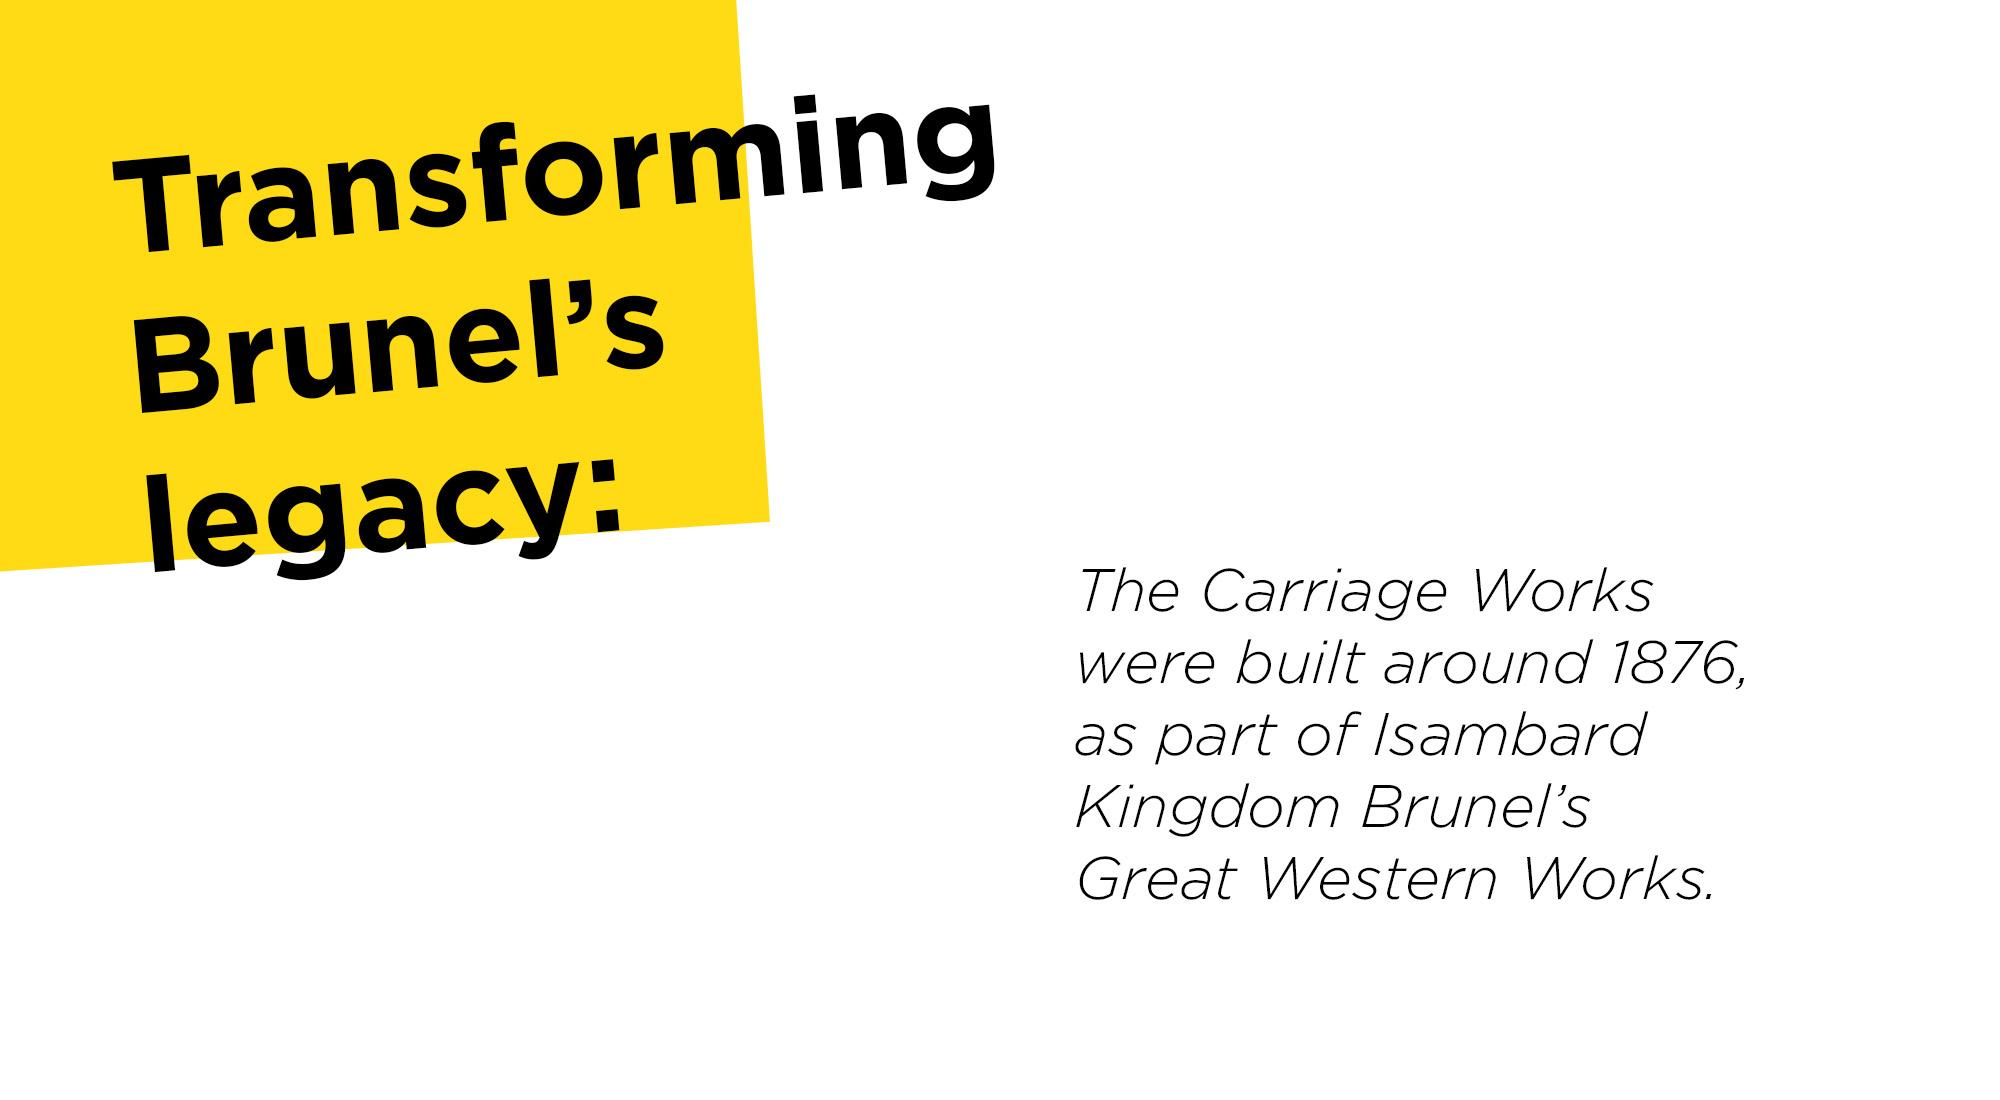 Transforming Brunel's legacy